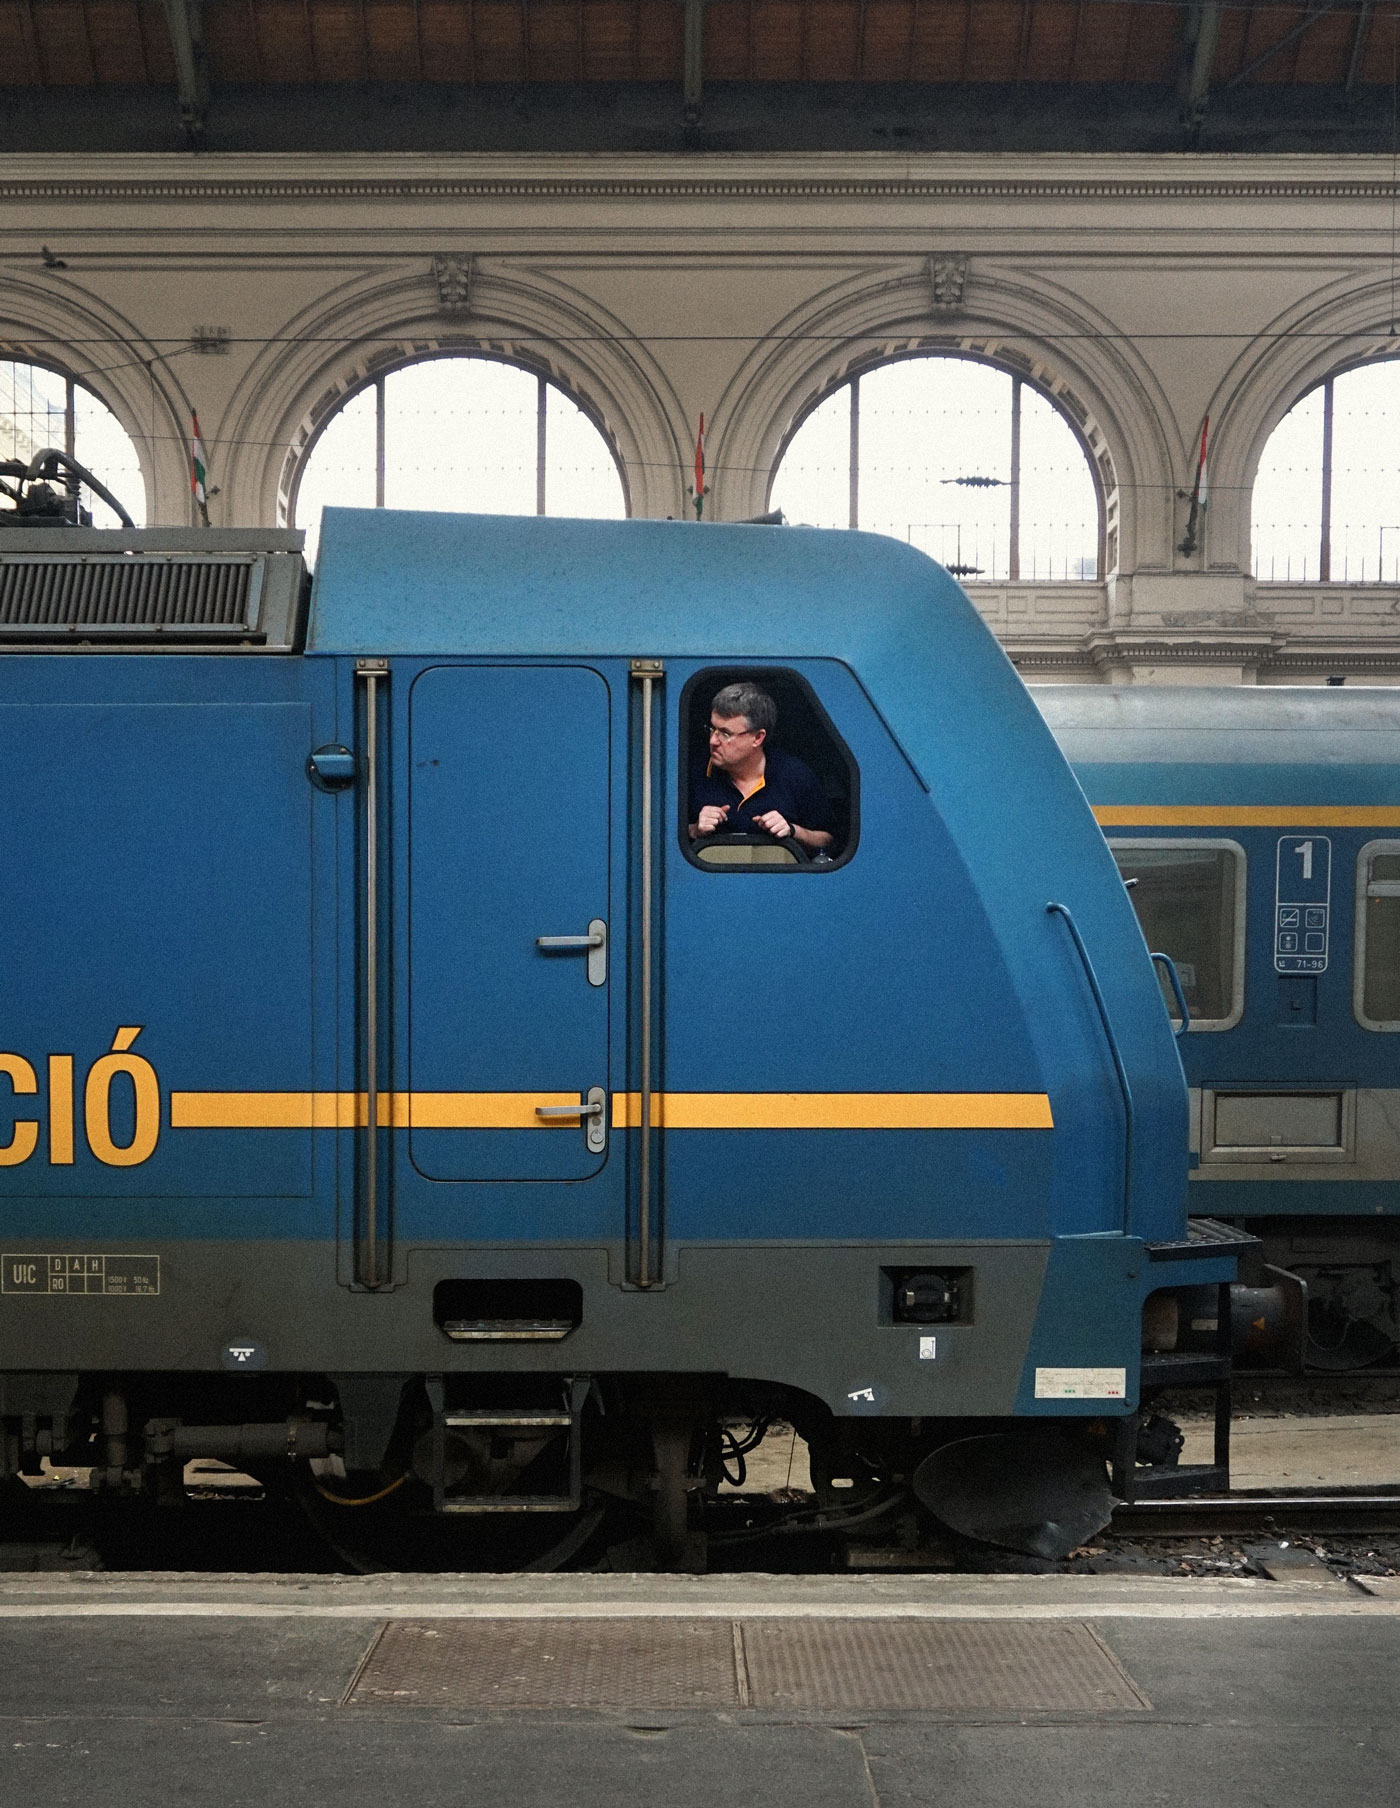 alex-laniosz-budapest-train-station-1.jpg